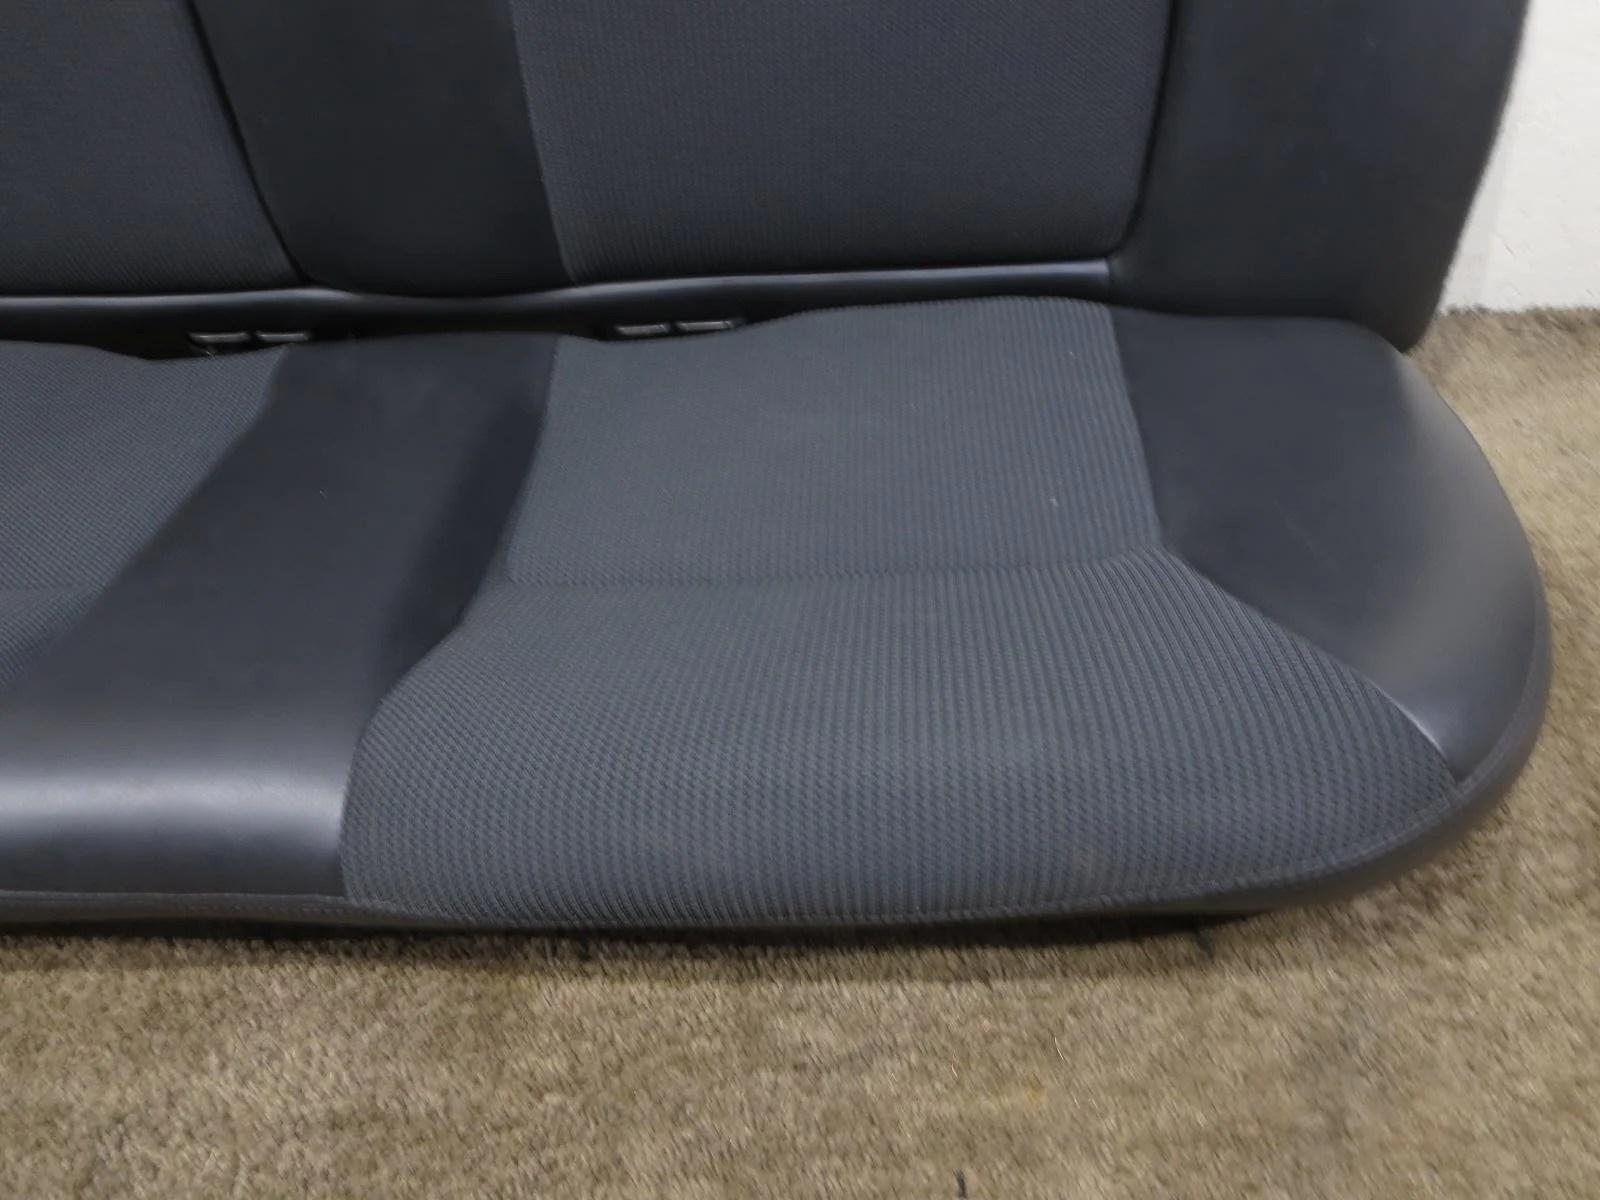 dodge neon srt4 srt 4 viper style black cloth rear seat 2003 2004 2005  [ 1600 x 1200 Pixel ]